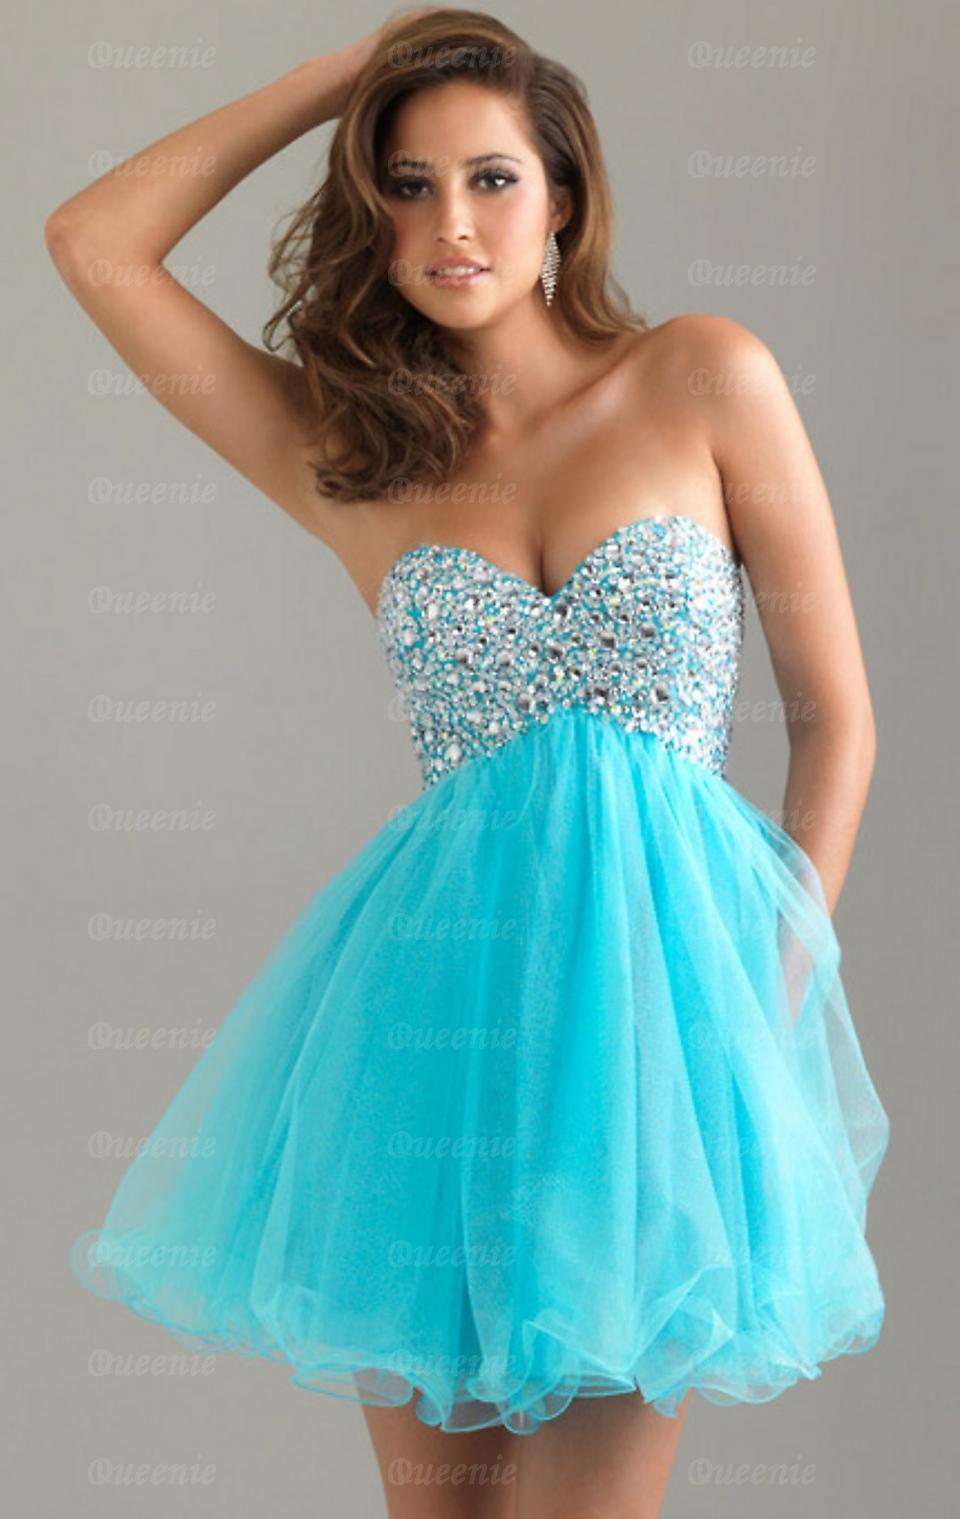 short blue winter formal dresses | Gommap Blog